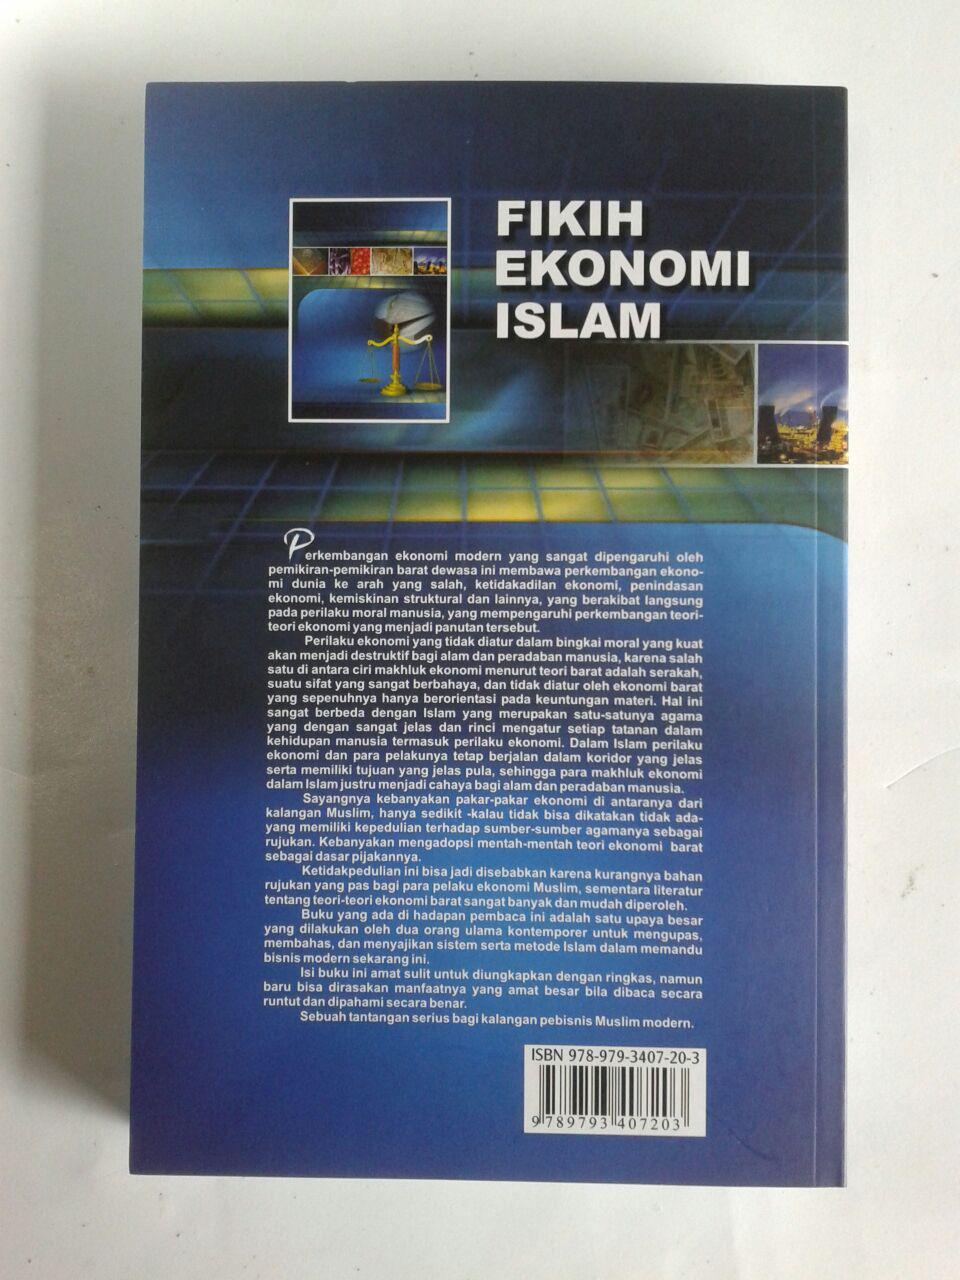 Buku Fikih Ekonomi Islam cover